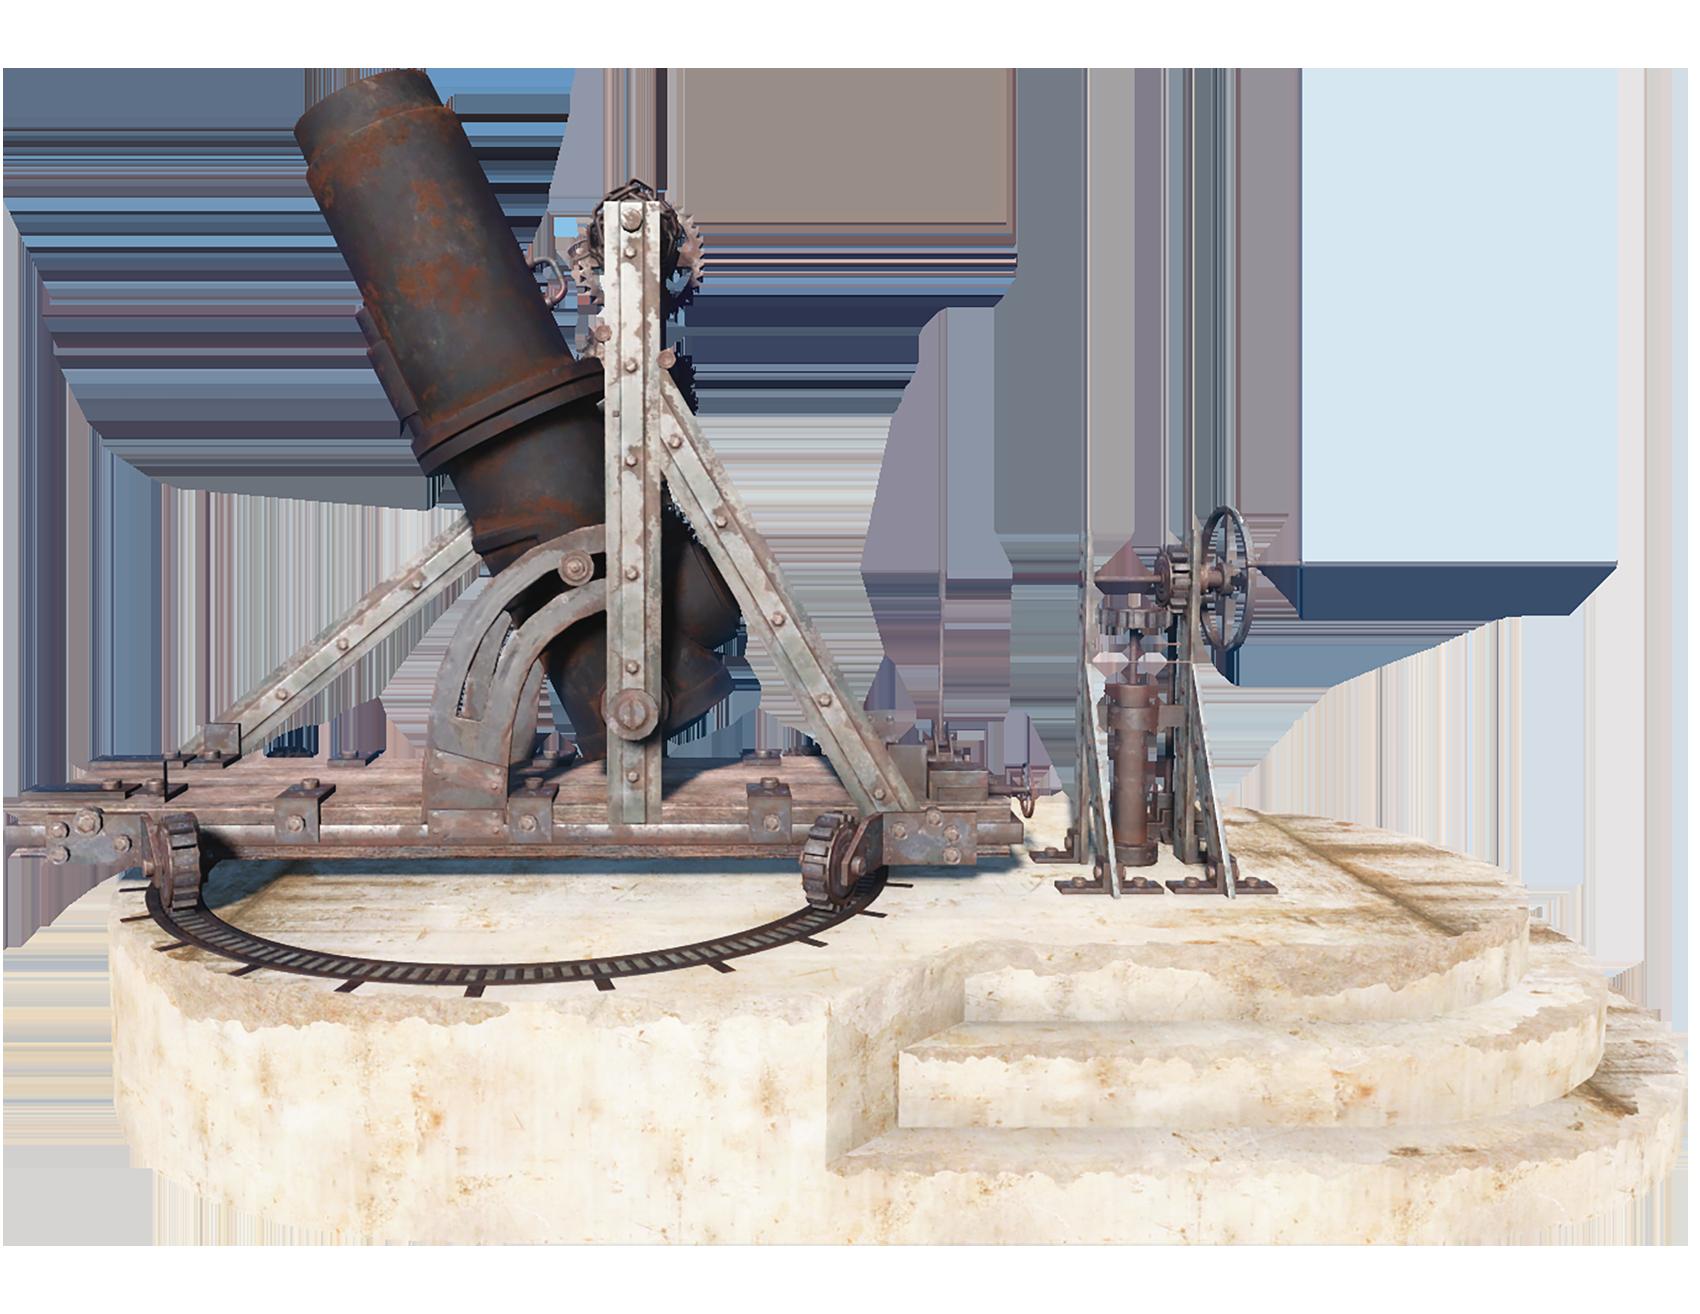 Artillery piece (Fallout 4)